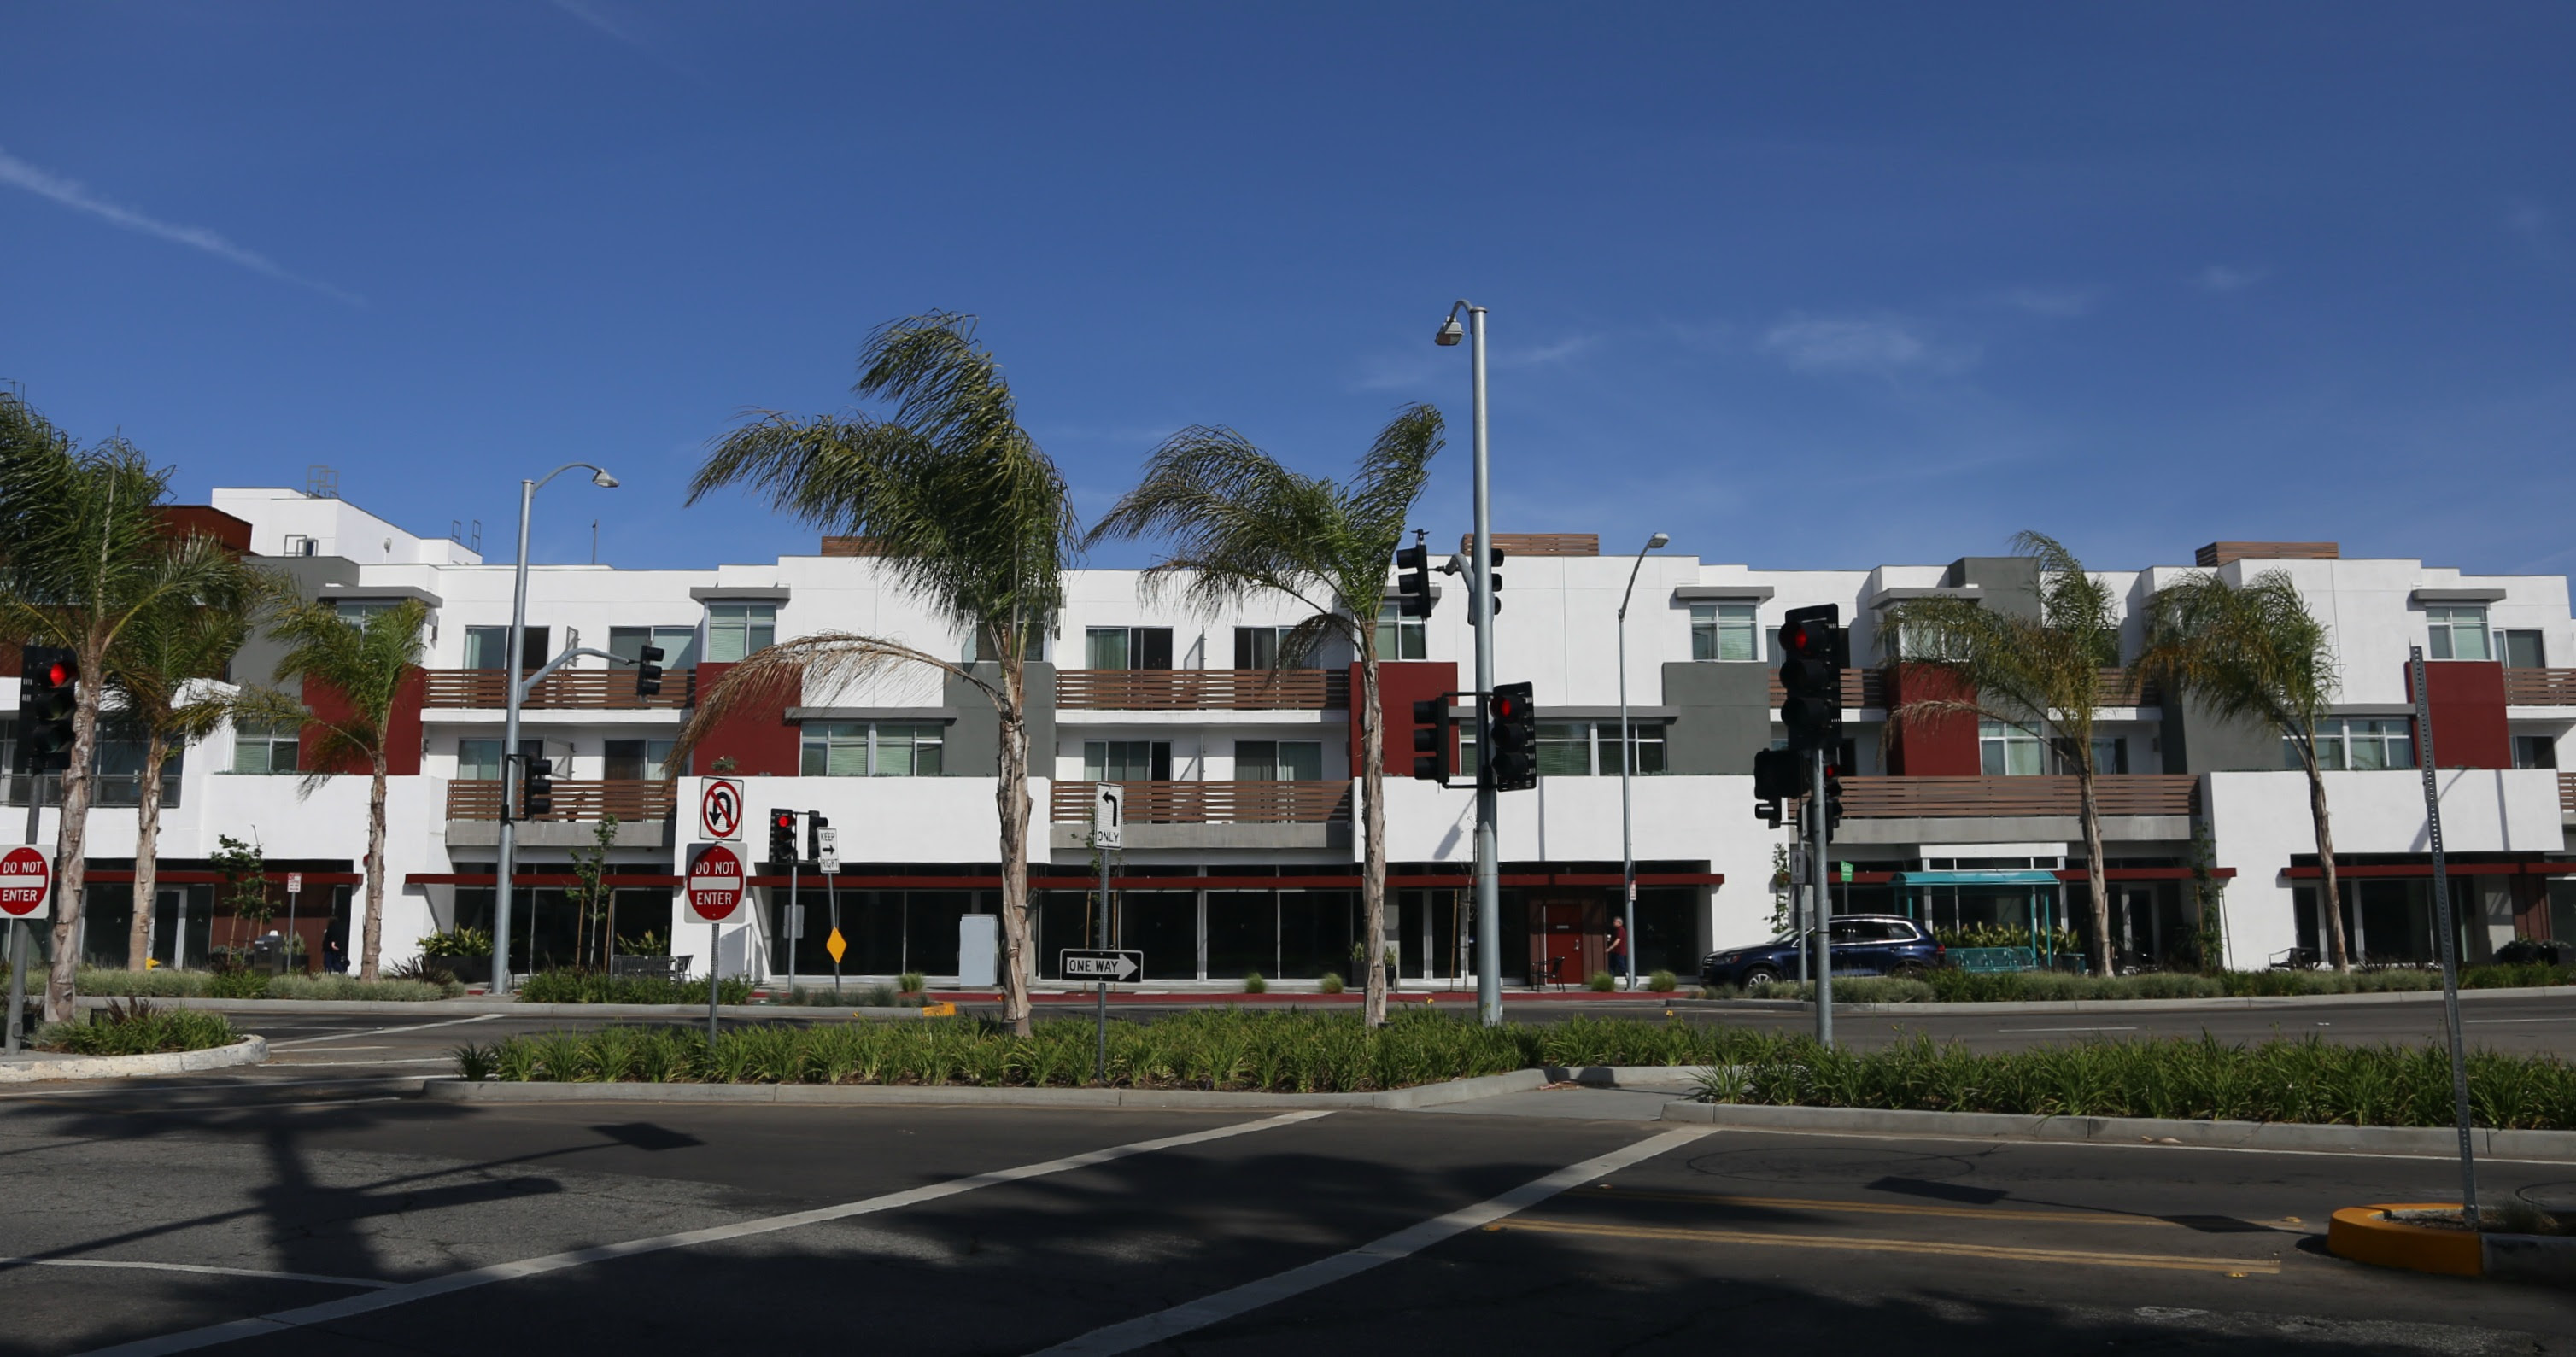 Culver City Mixed Use Apartment Building